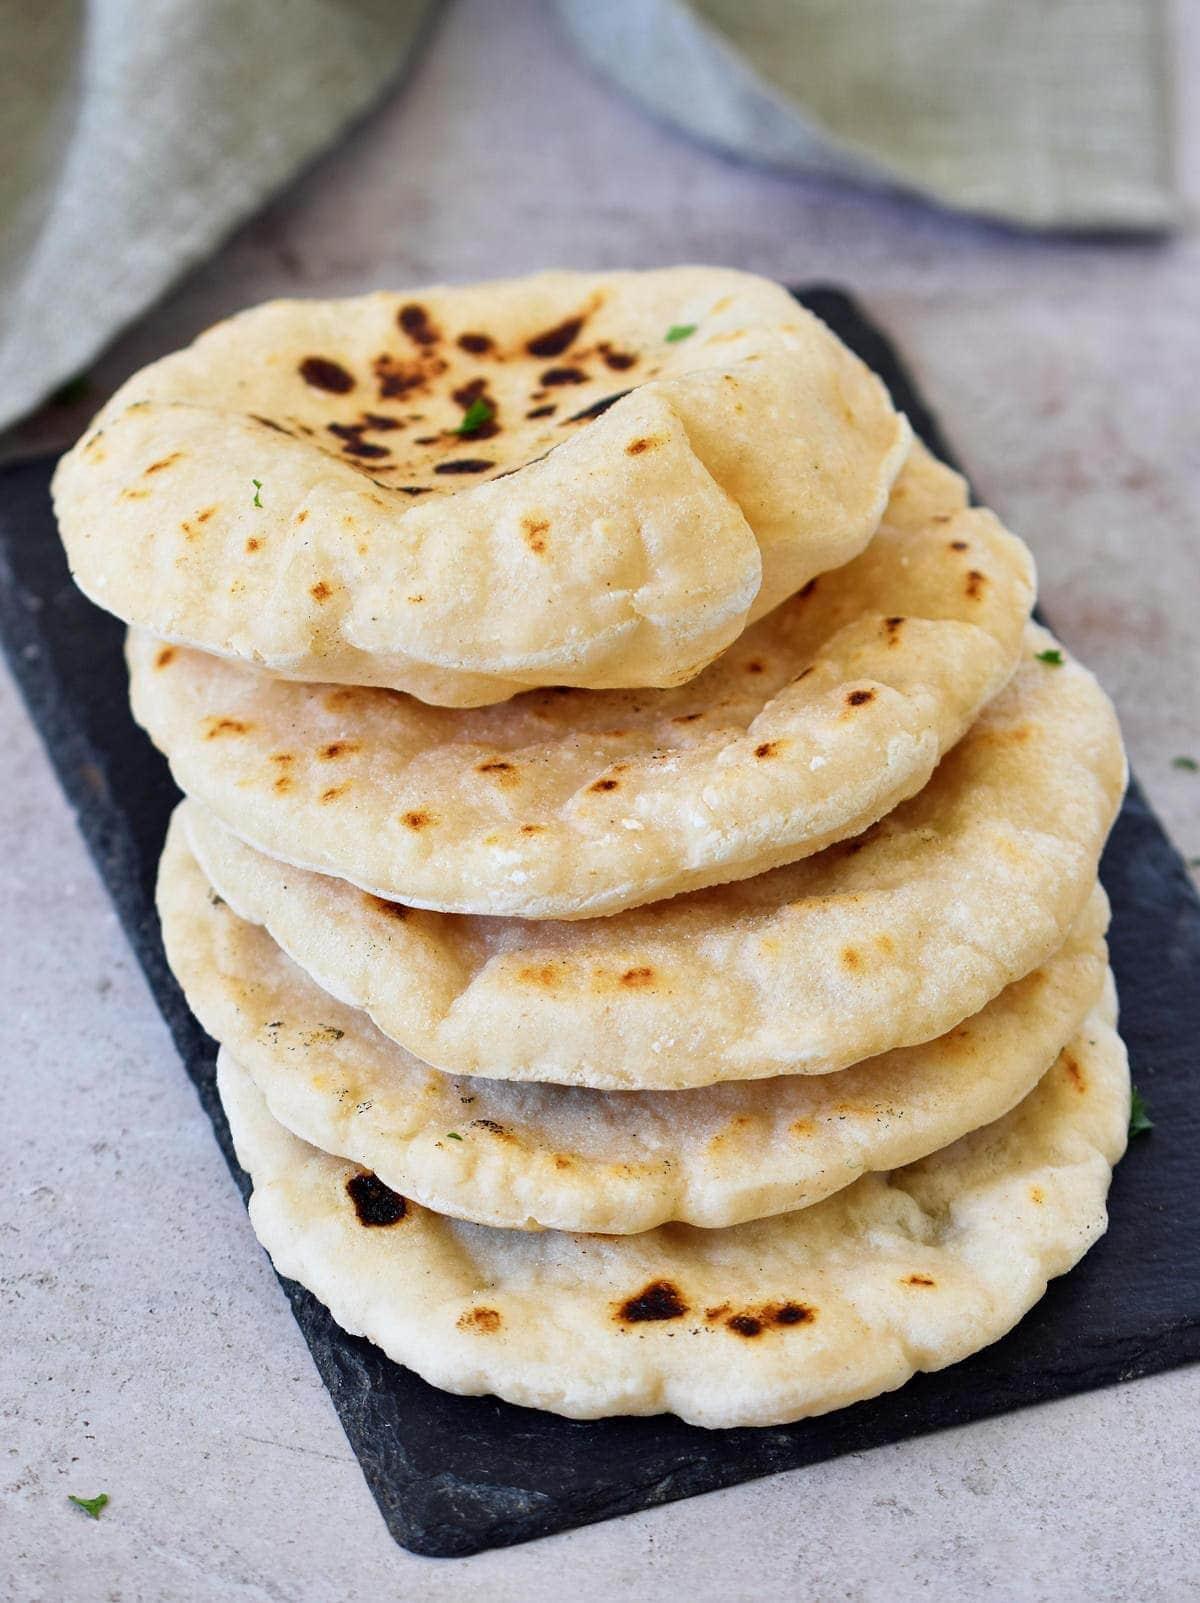 homemade gluten-free flatbread